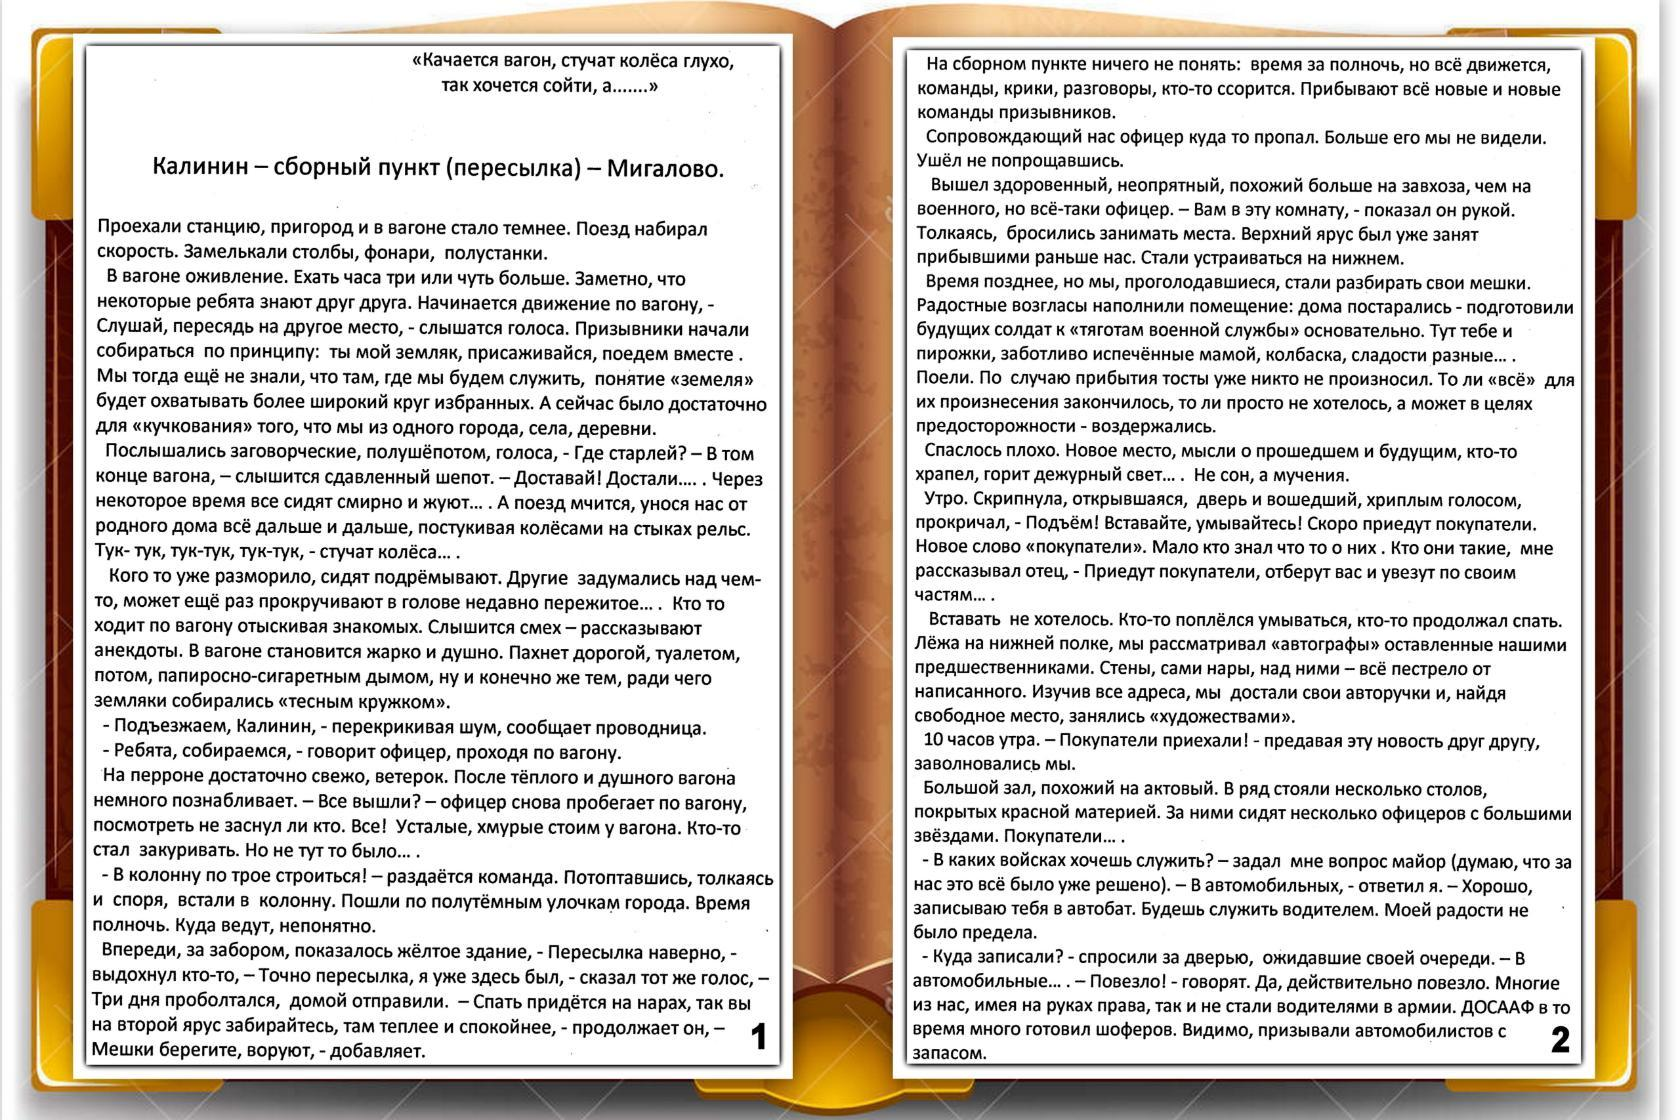 http://se.uploads.ru/Xtmcz.jpg